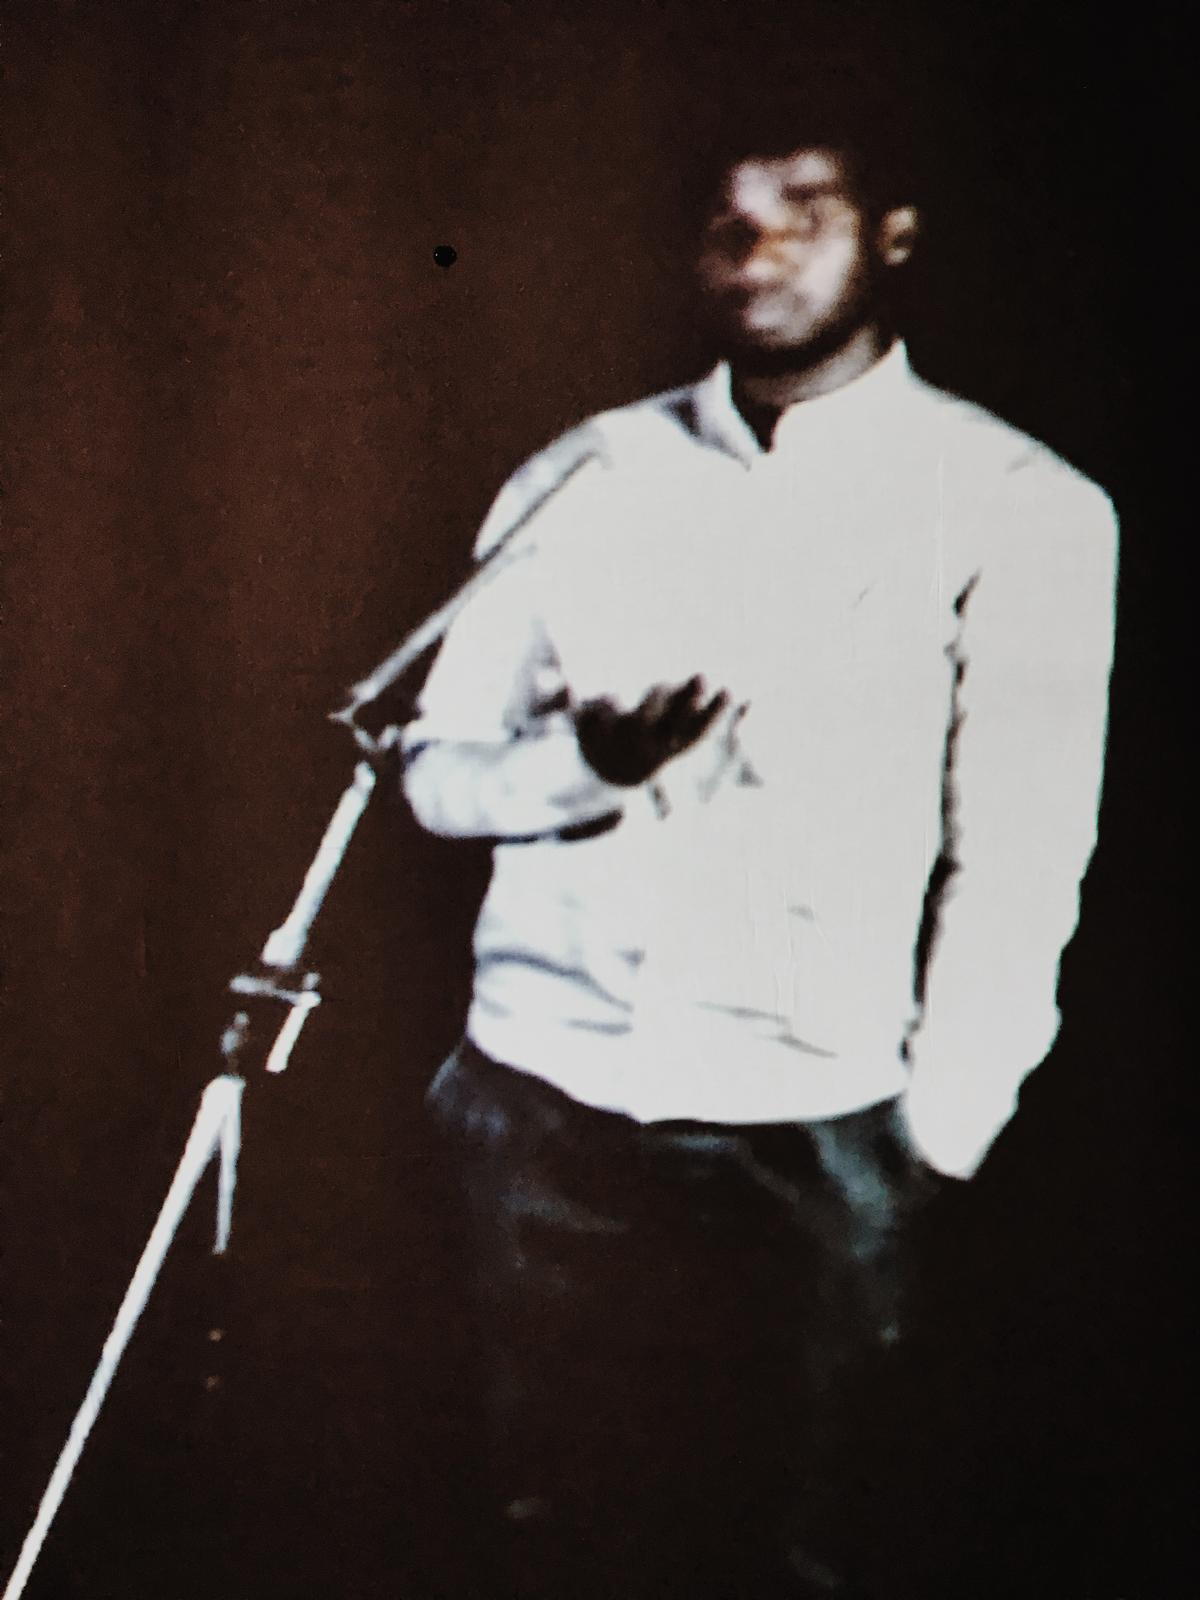 Dogon Nshimiyimana speaking through a portal in Kigali, Rwanda. CREDIT ALYCIN BEKTESH / ASPEN PUBLIC RADIO NEWS